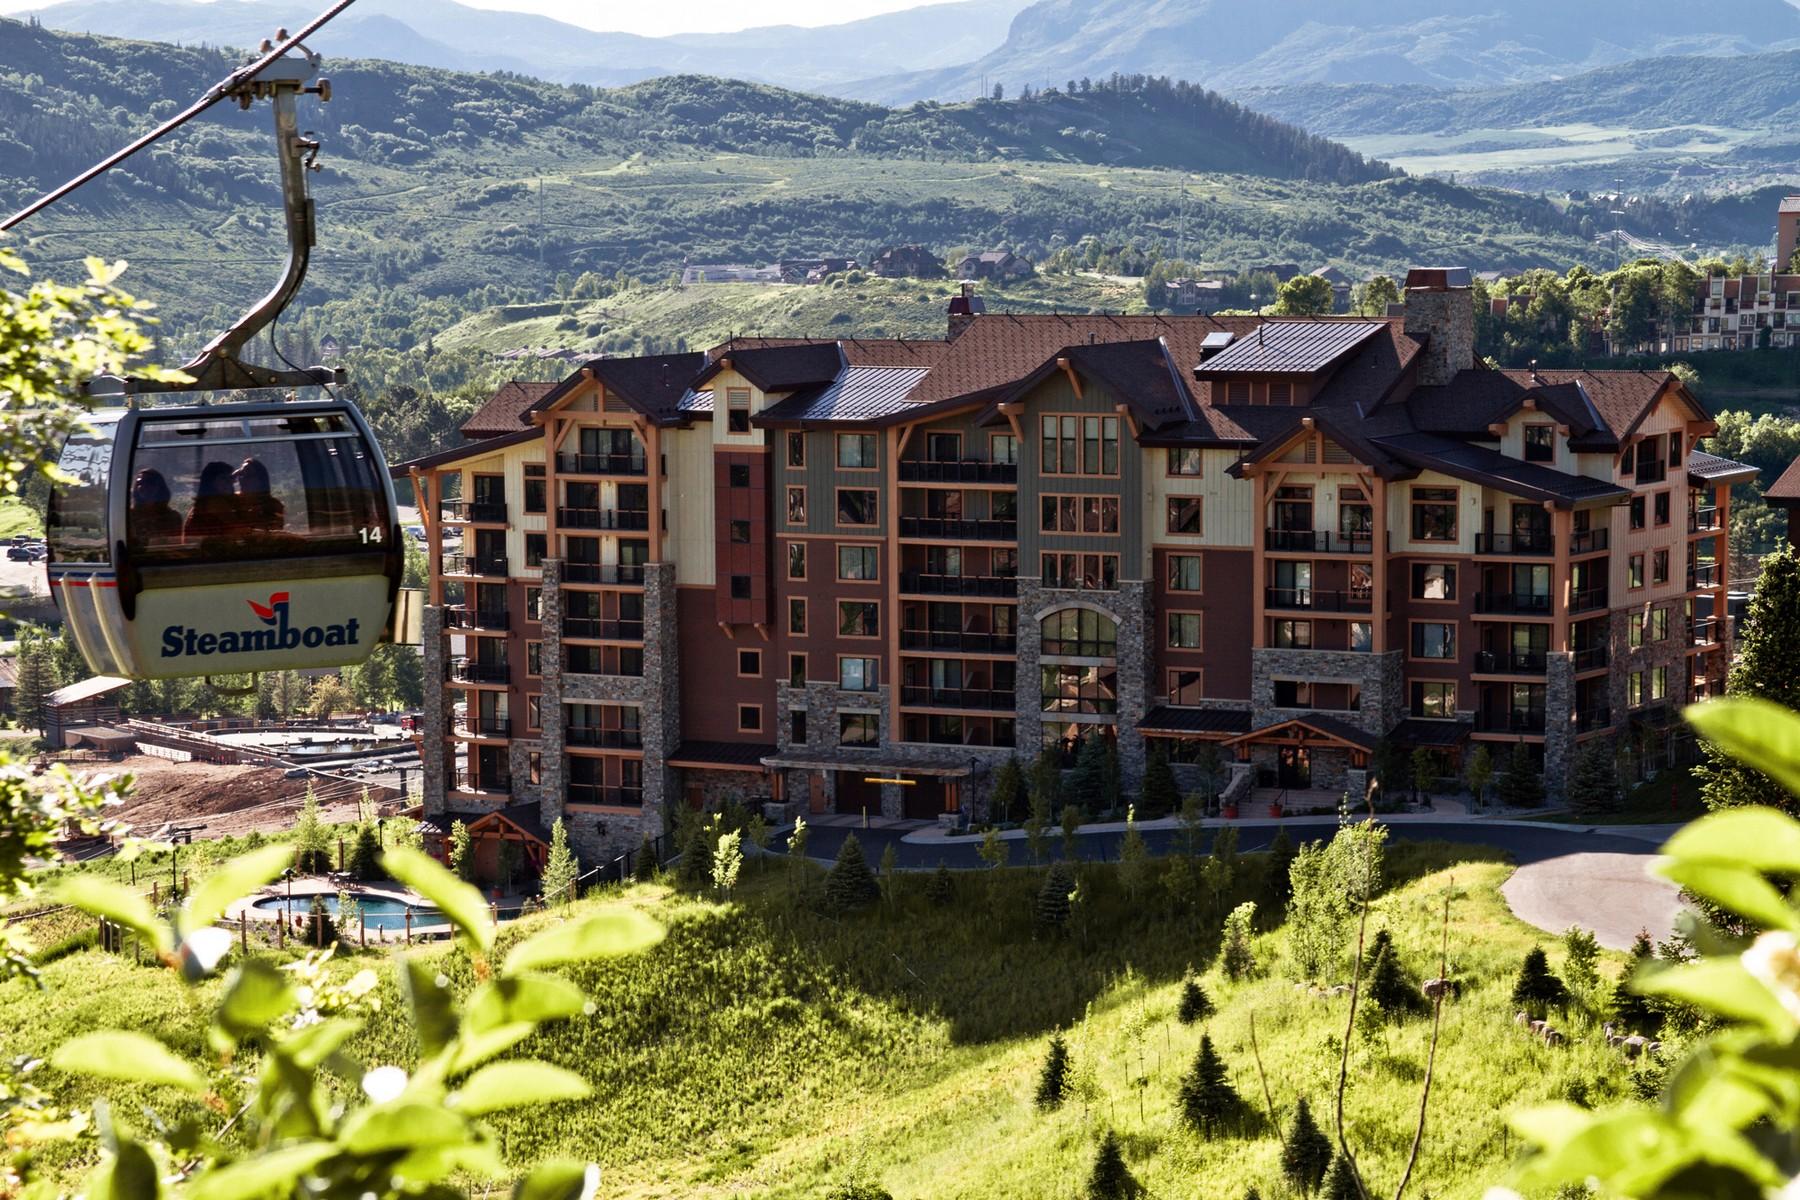 Condominium for Sale at Edgemont 2410 Ski Trail Lane #2802 Steamboat Springs, Colorado 80487 United States